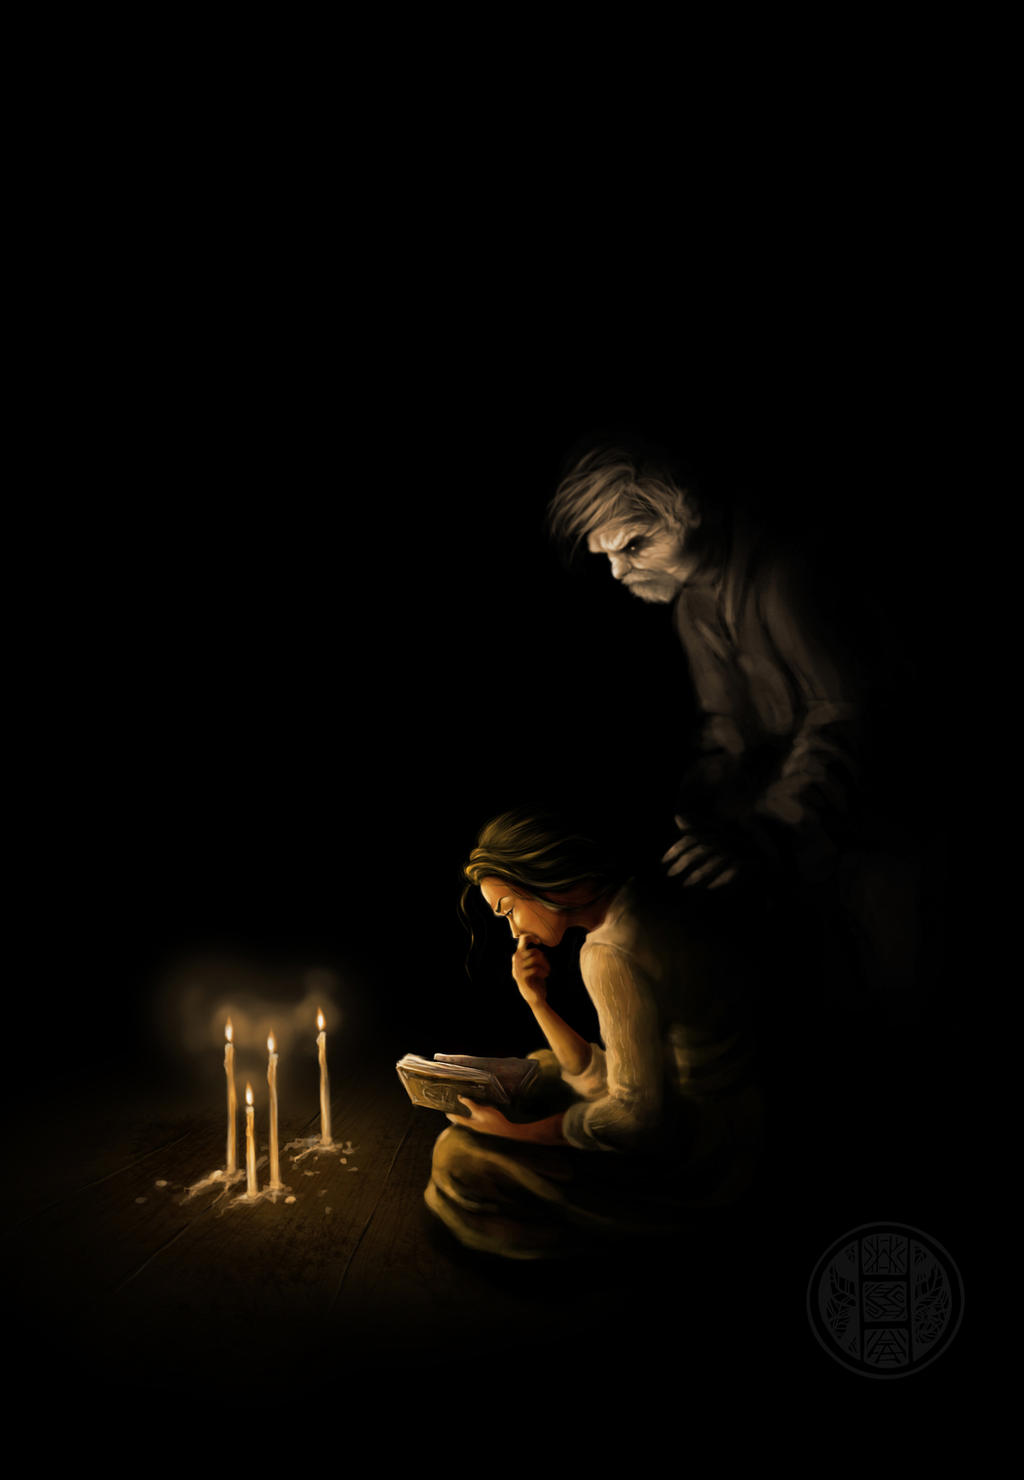 Asenath and Ephraim Waite by Jizebelle